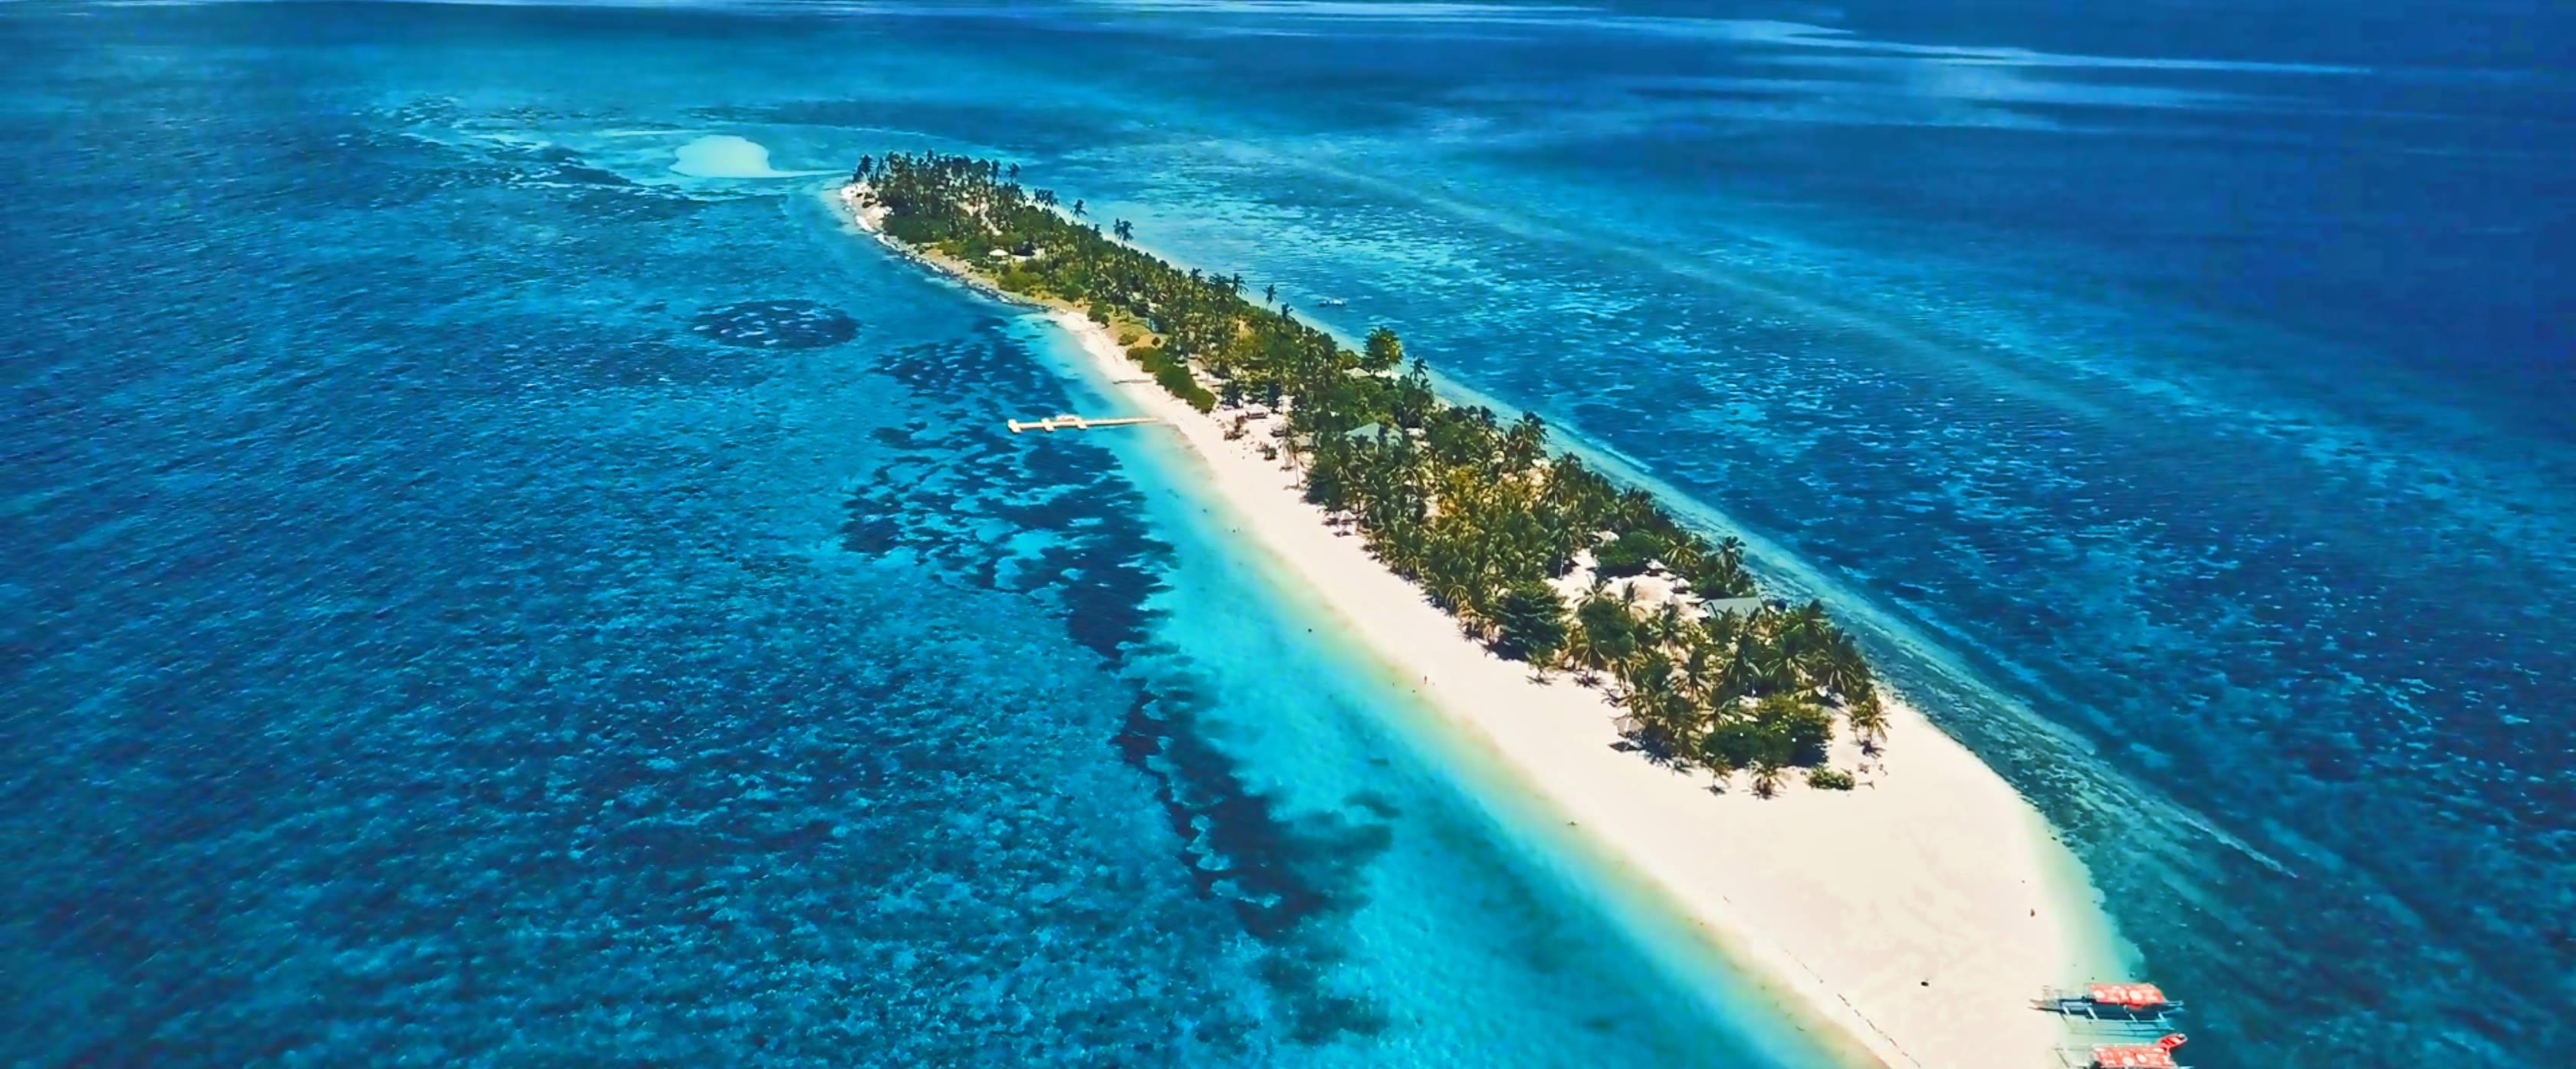 Kalanggaman-Island-Leyte-Aerial-Tour-Project-LUPAD-JPG